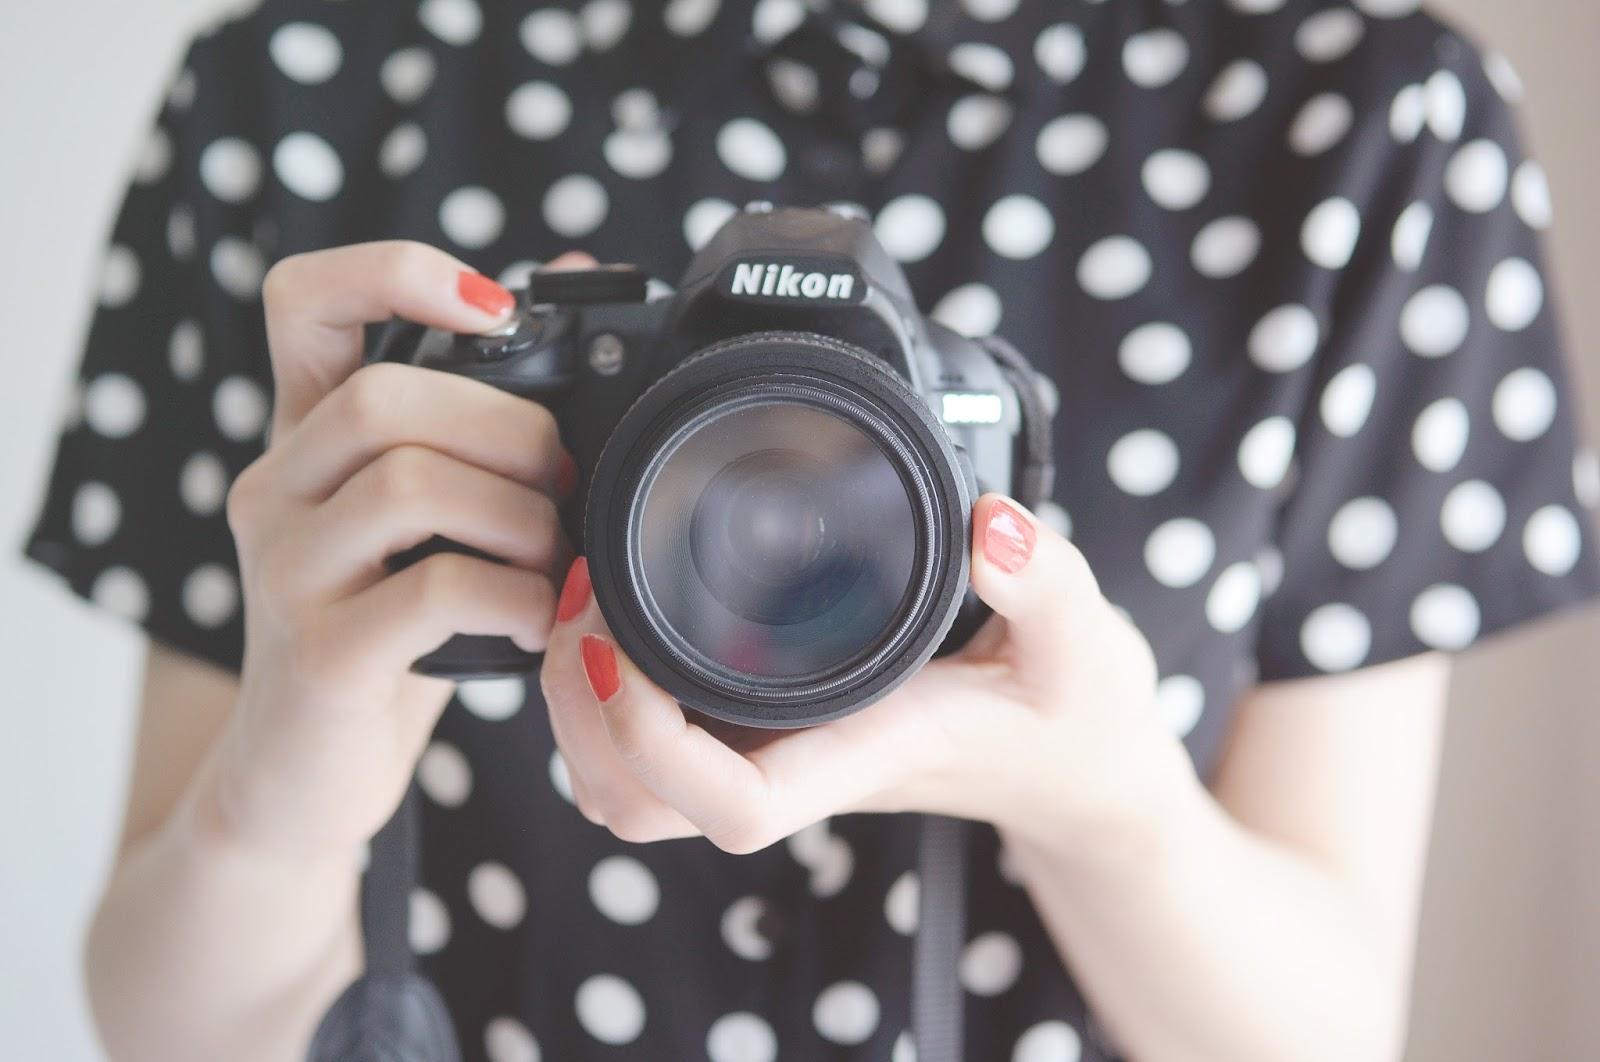 DLSR Nikon d3100, fashion bloggers camera